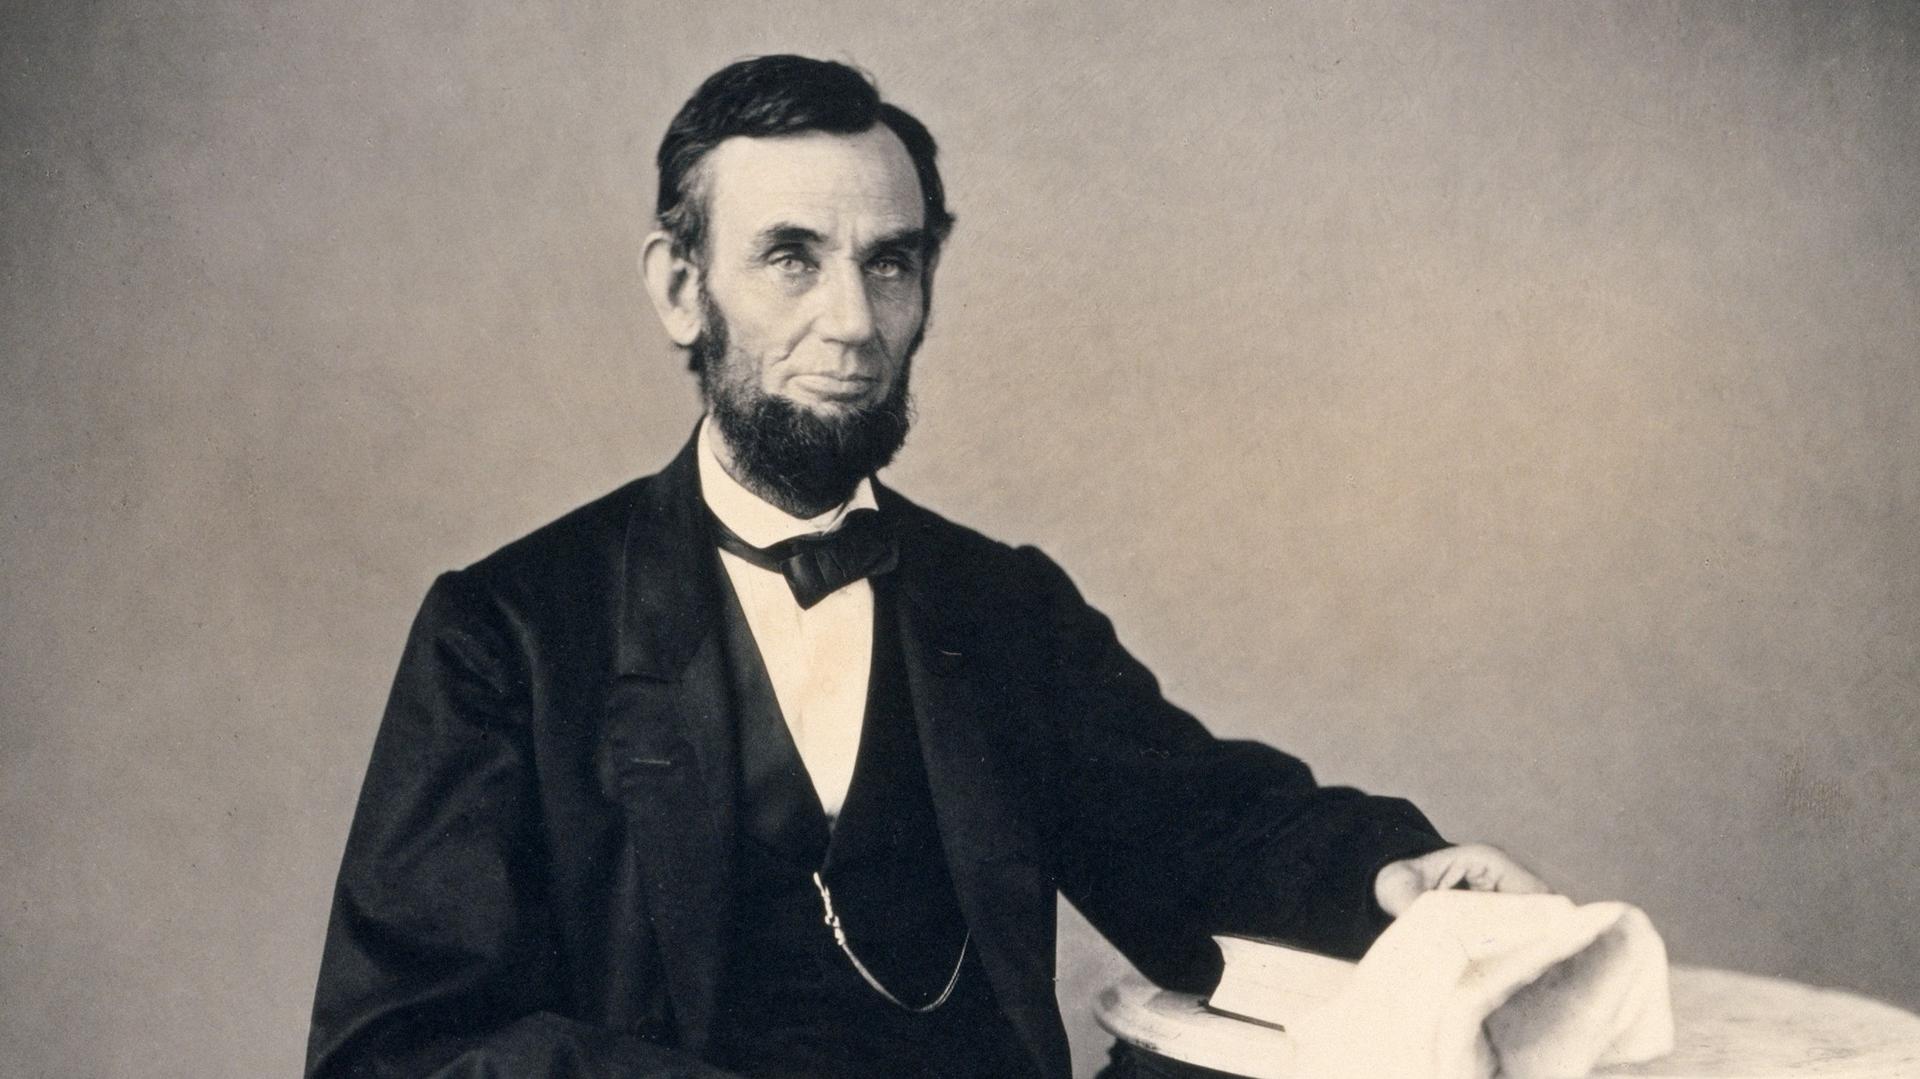 Abraham Lincoln, expresidente de EEUU - Sputnik Mundo, 1920, 28.04.2021